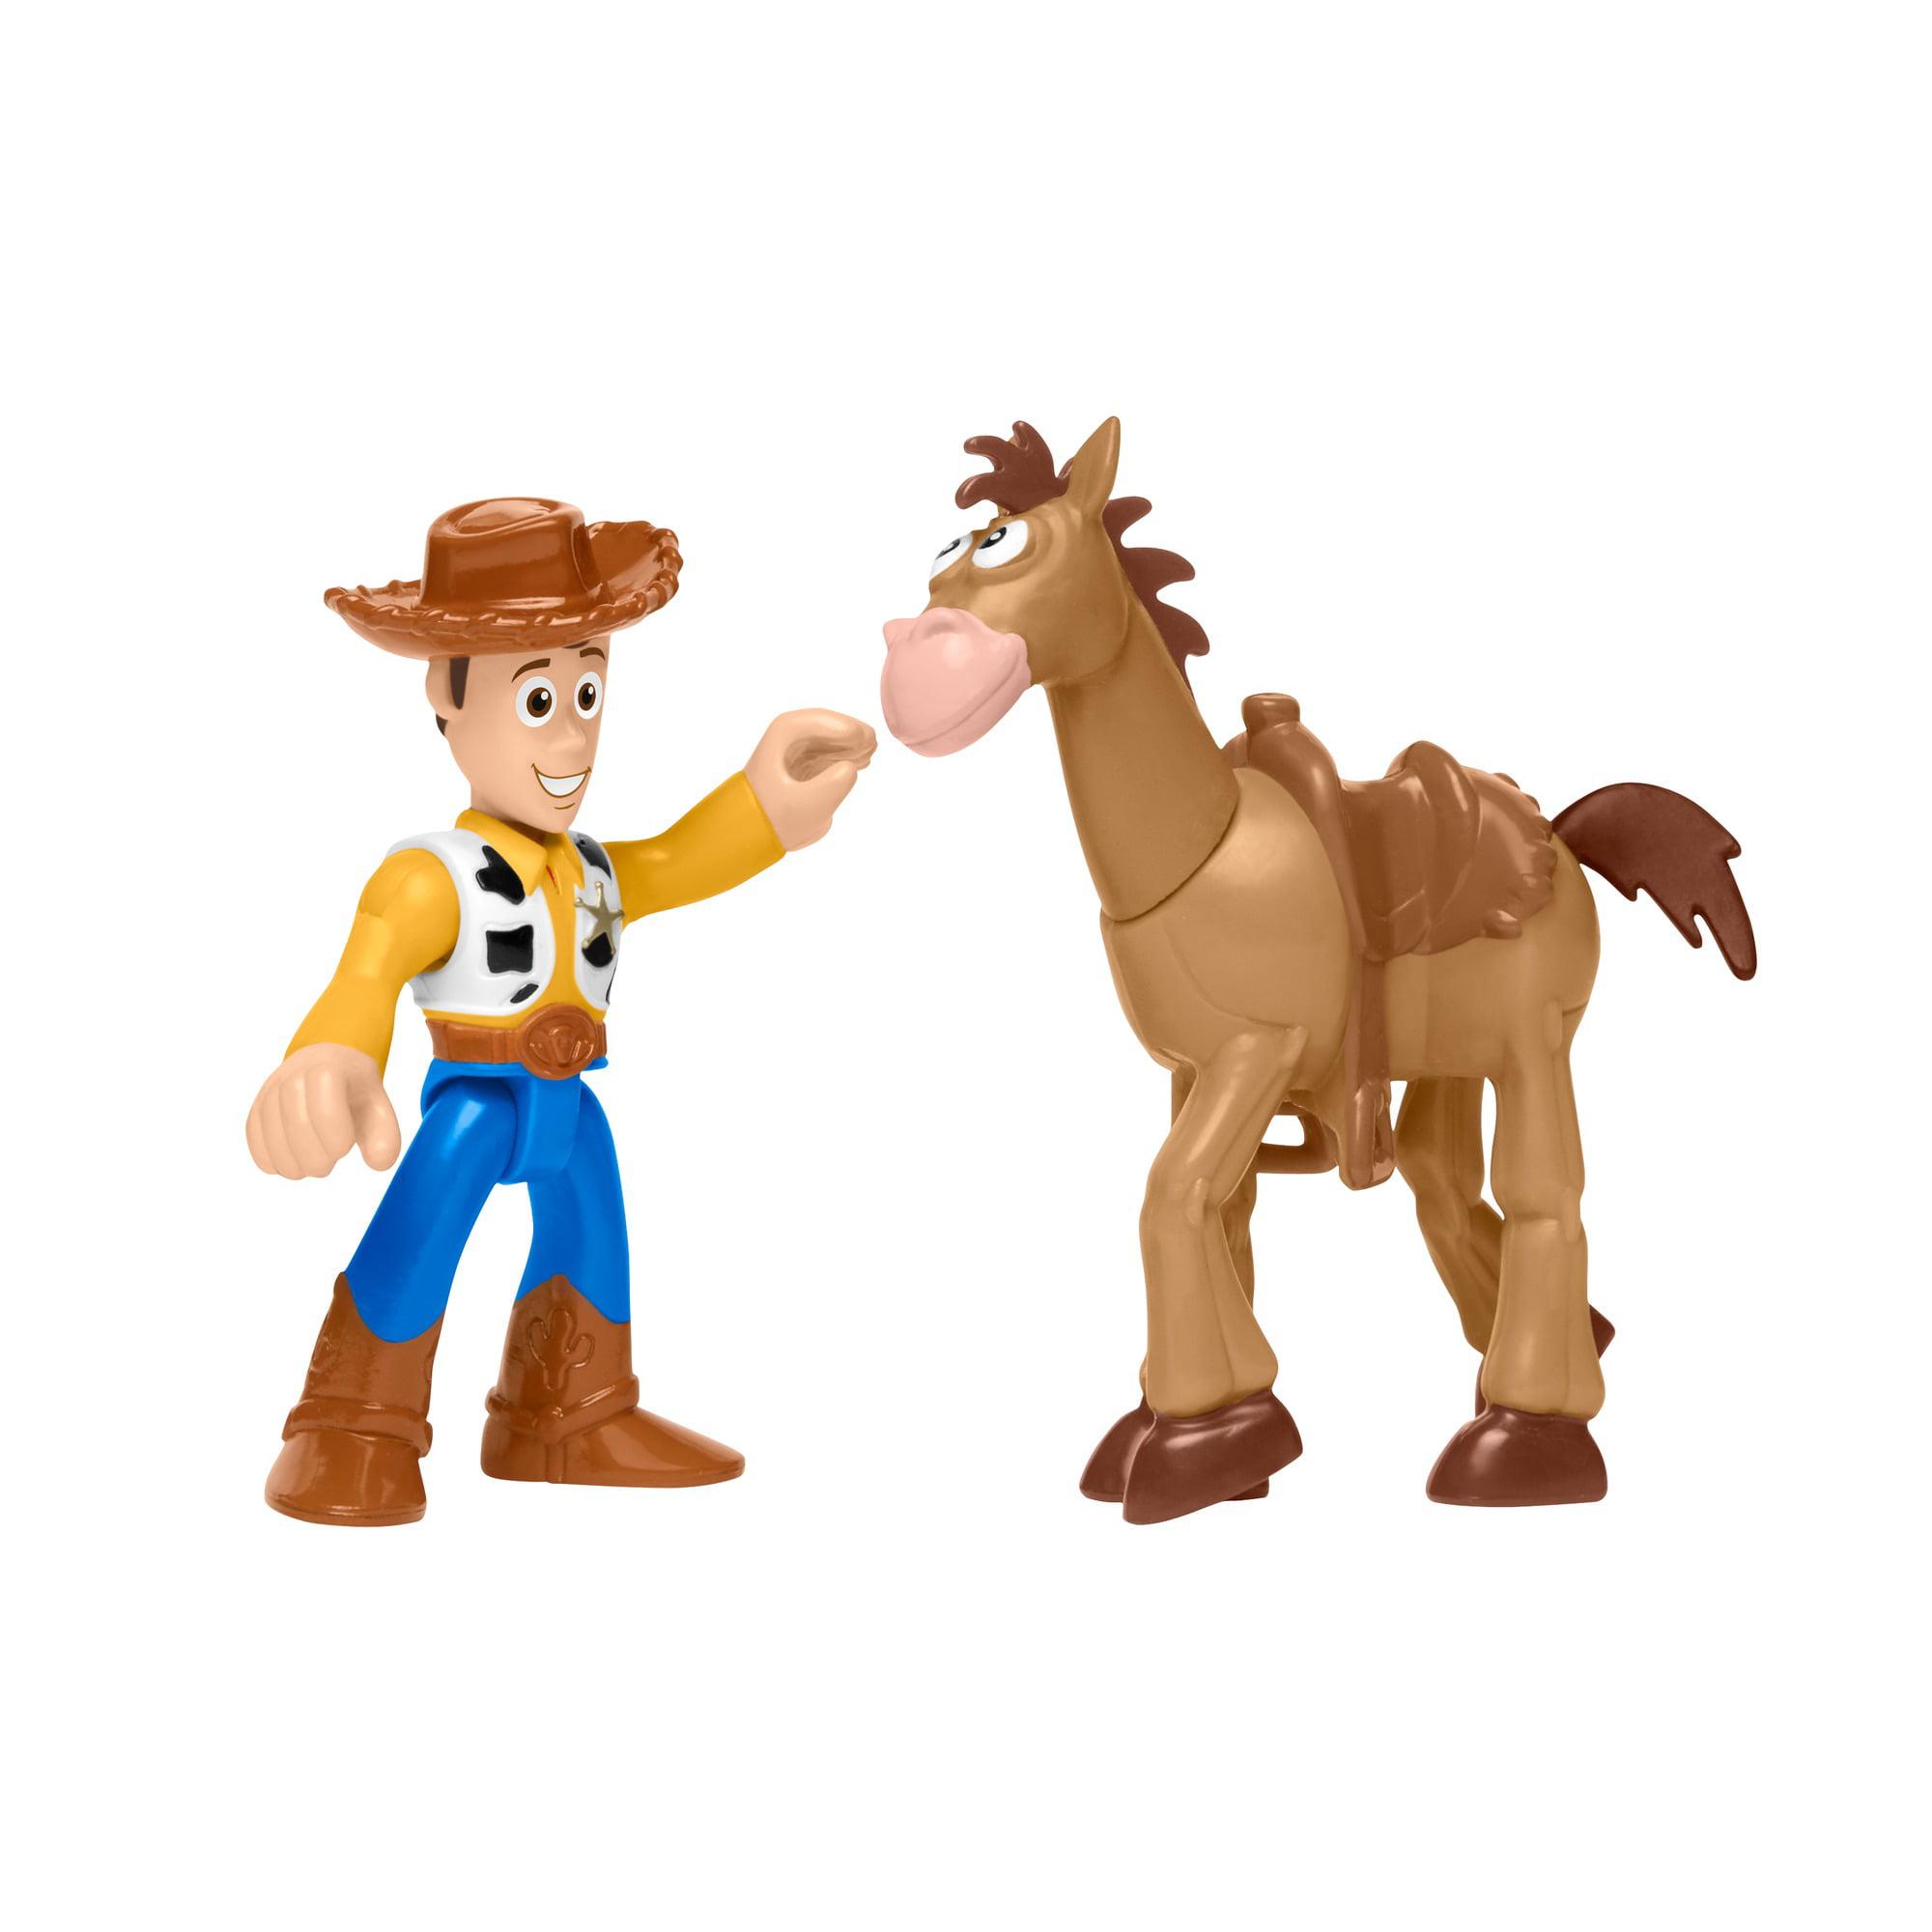 Imaginext Disney/Pixar Toy Story 4 Woddy & Bullseye